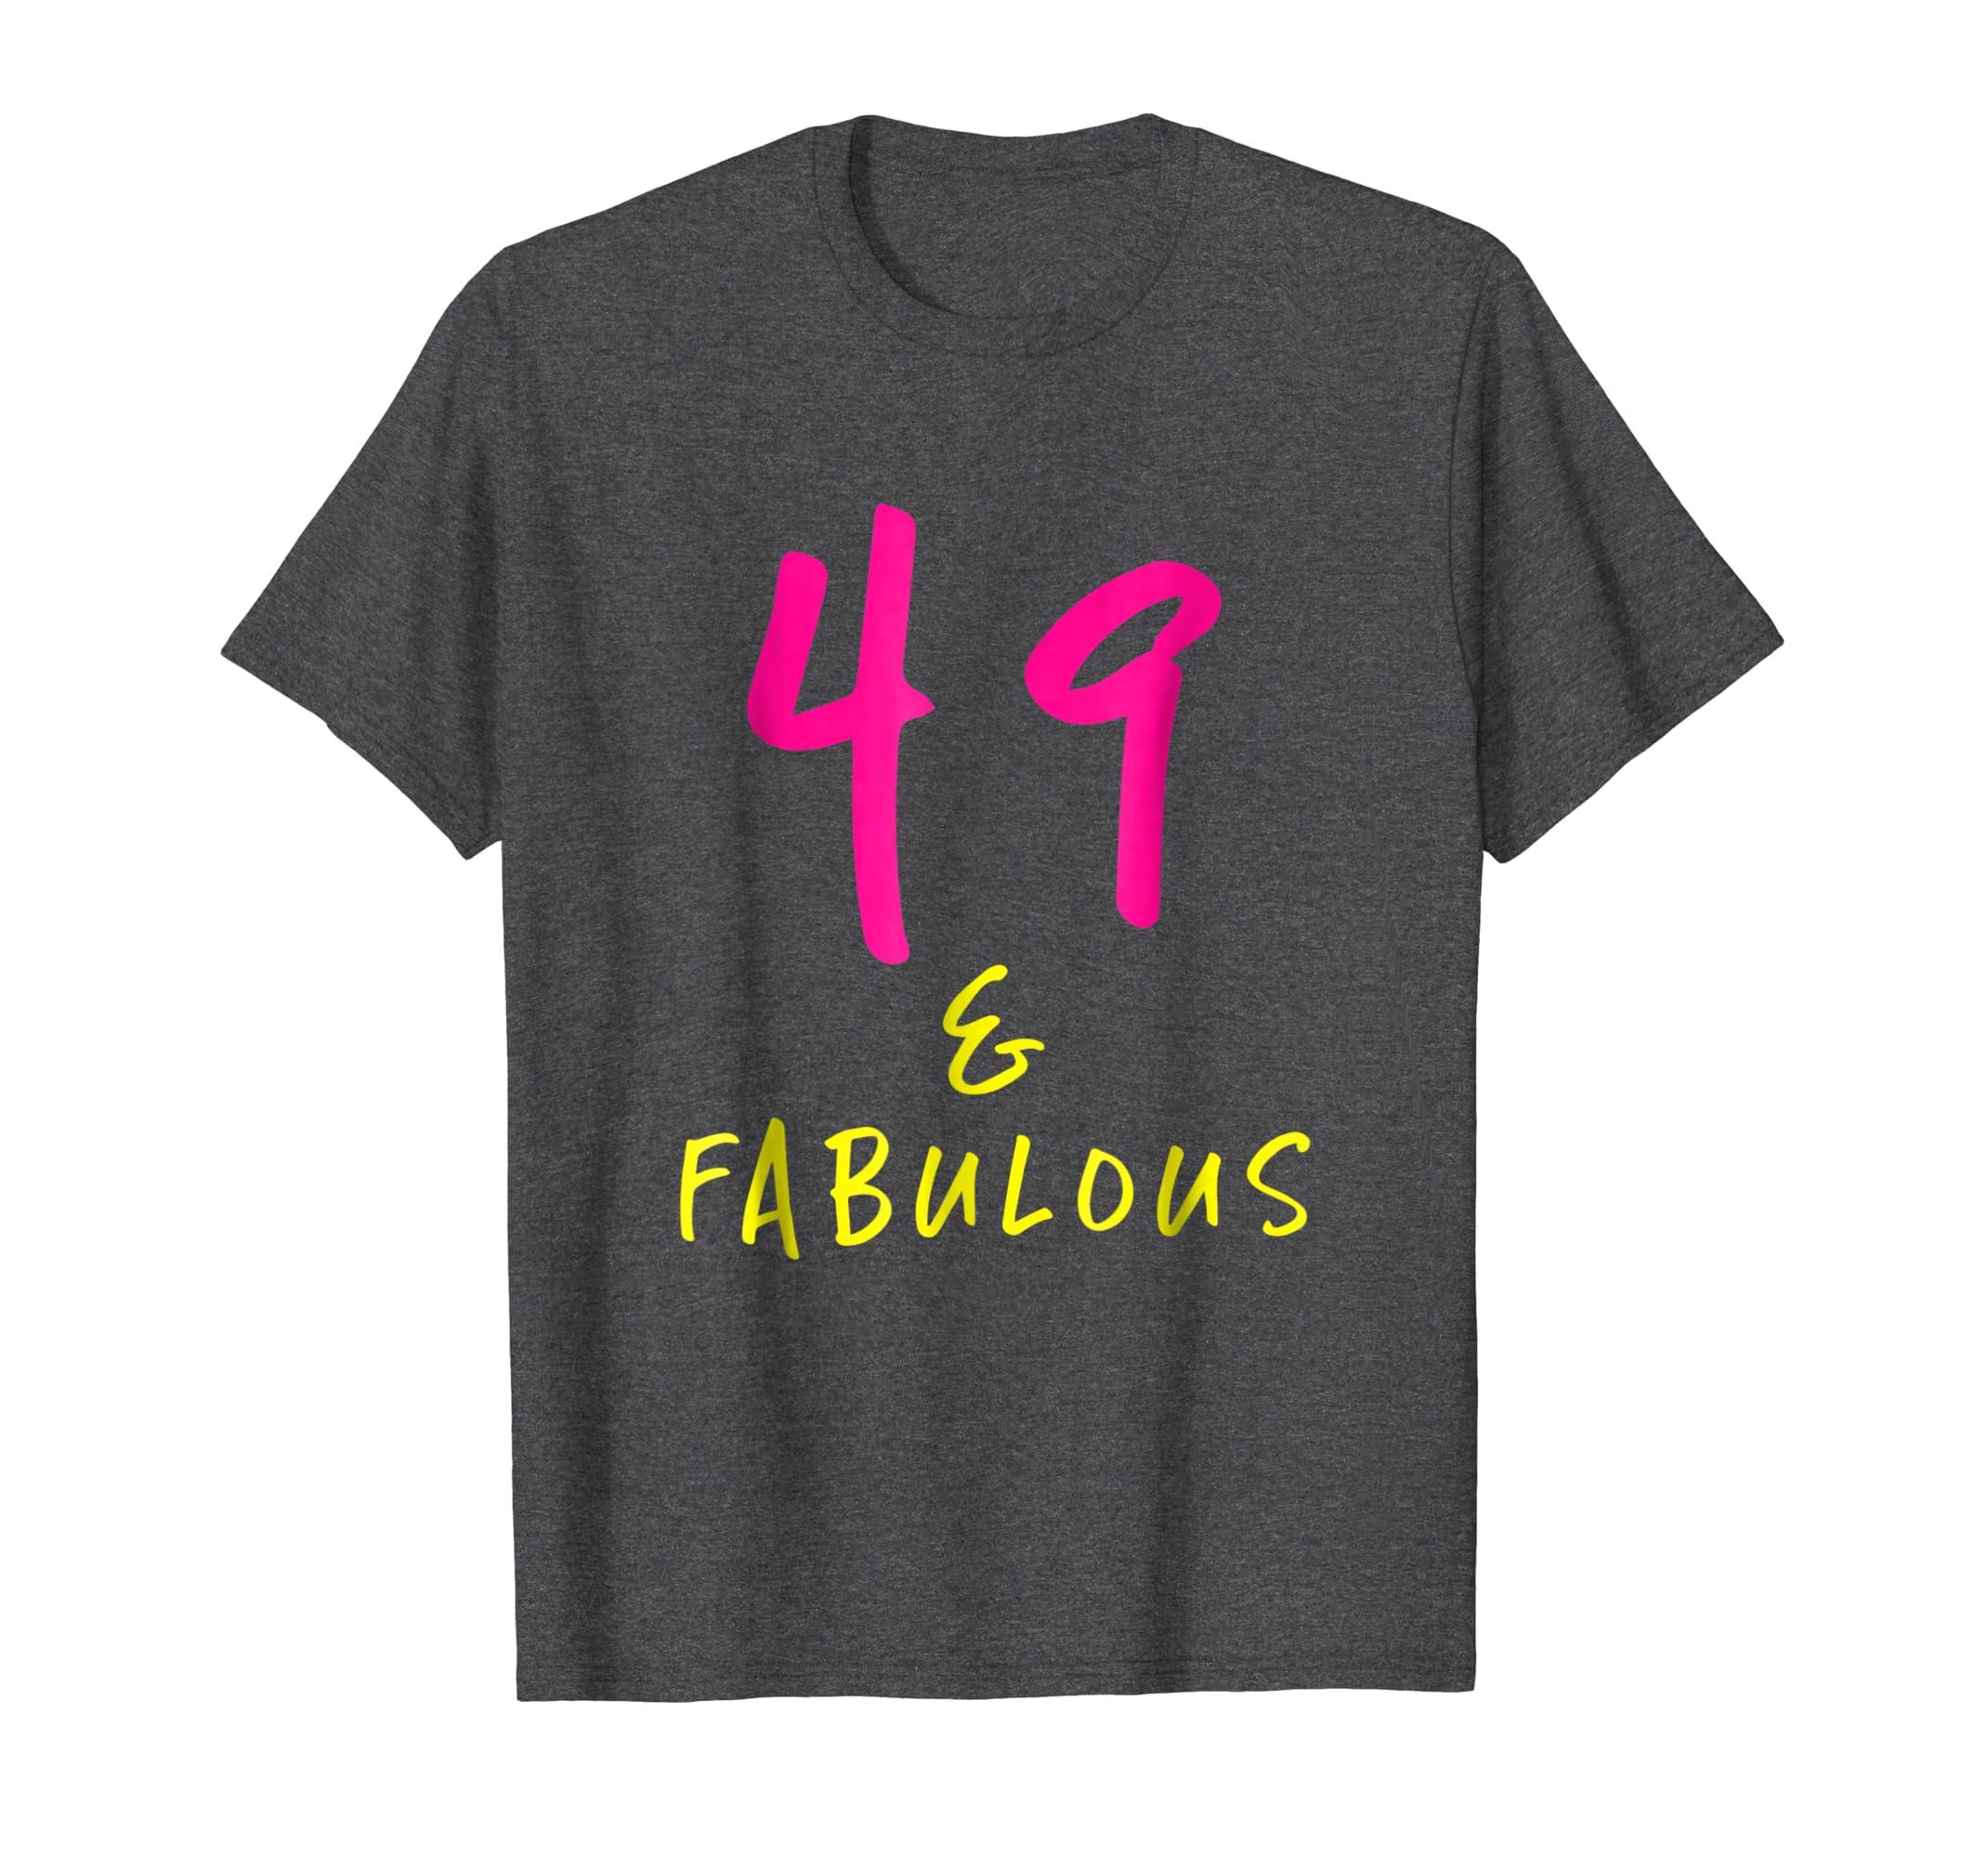 9d68a582 Amazon.com: 49 & Fabulous T Shirt: Clothing